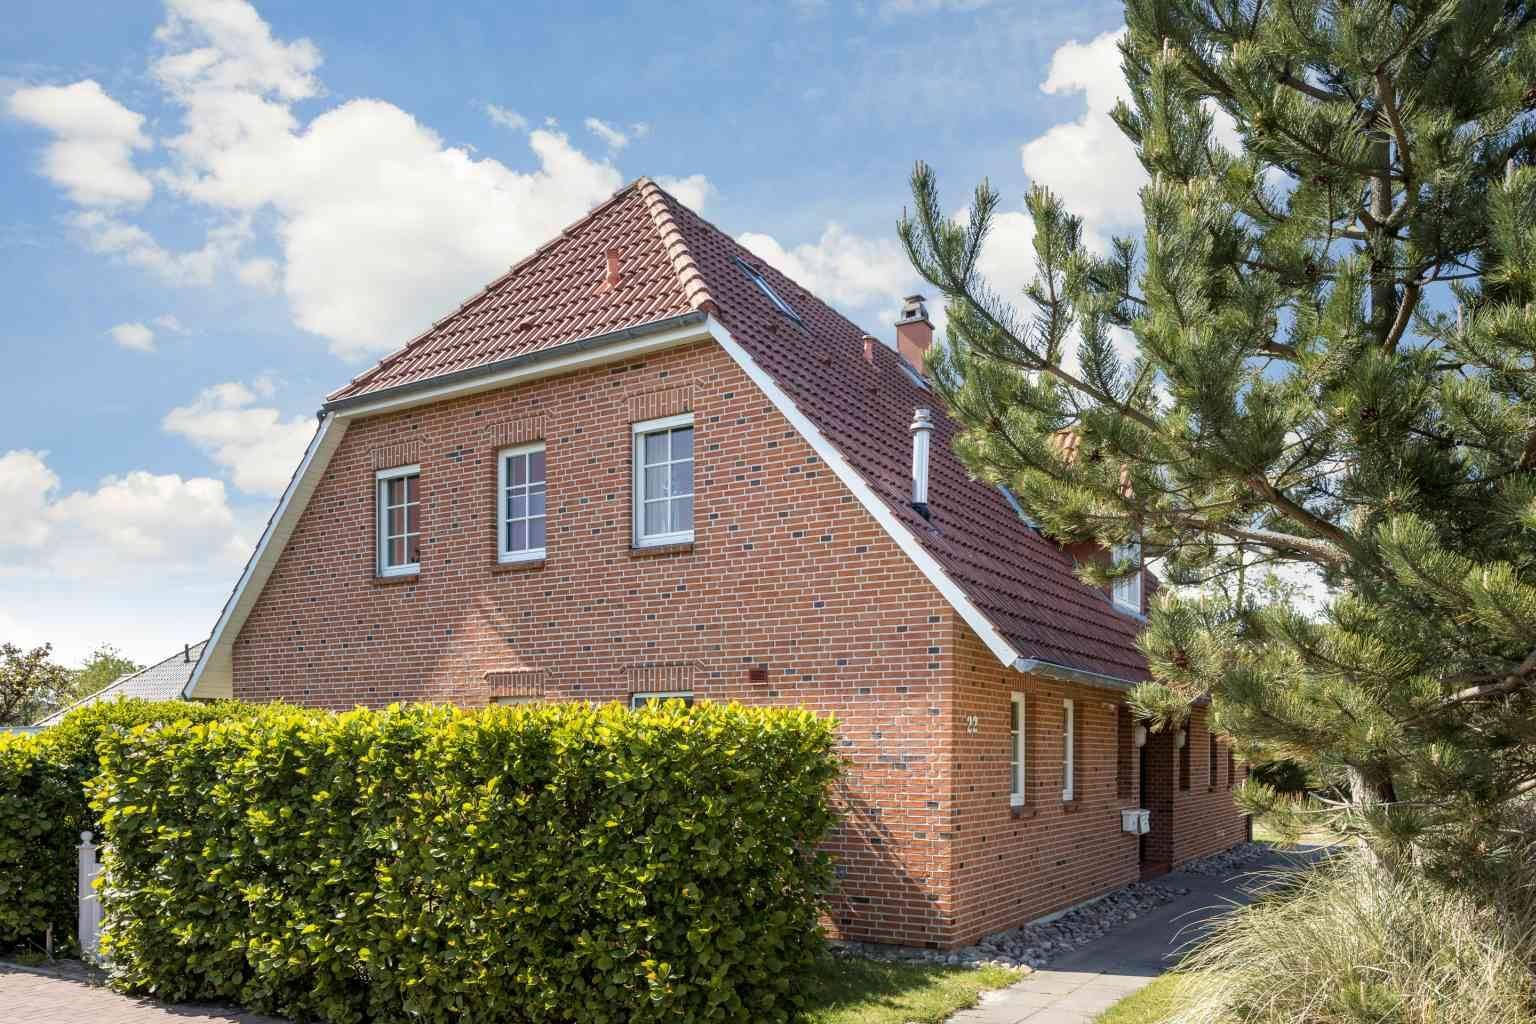 "Nordostansicht - St Peter Ording Dorf, Haus Ostlandstrasse 22, Hausteil ""Ringelsocke"""